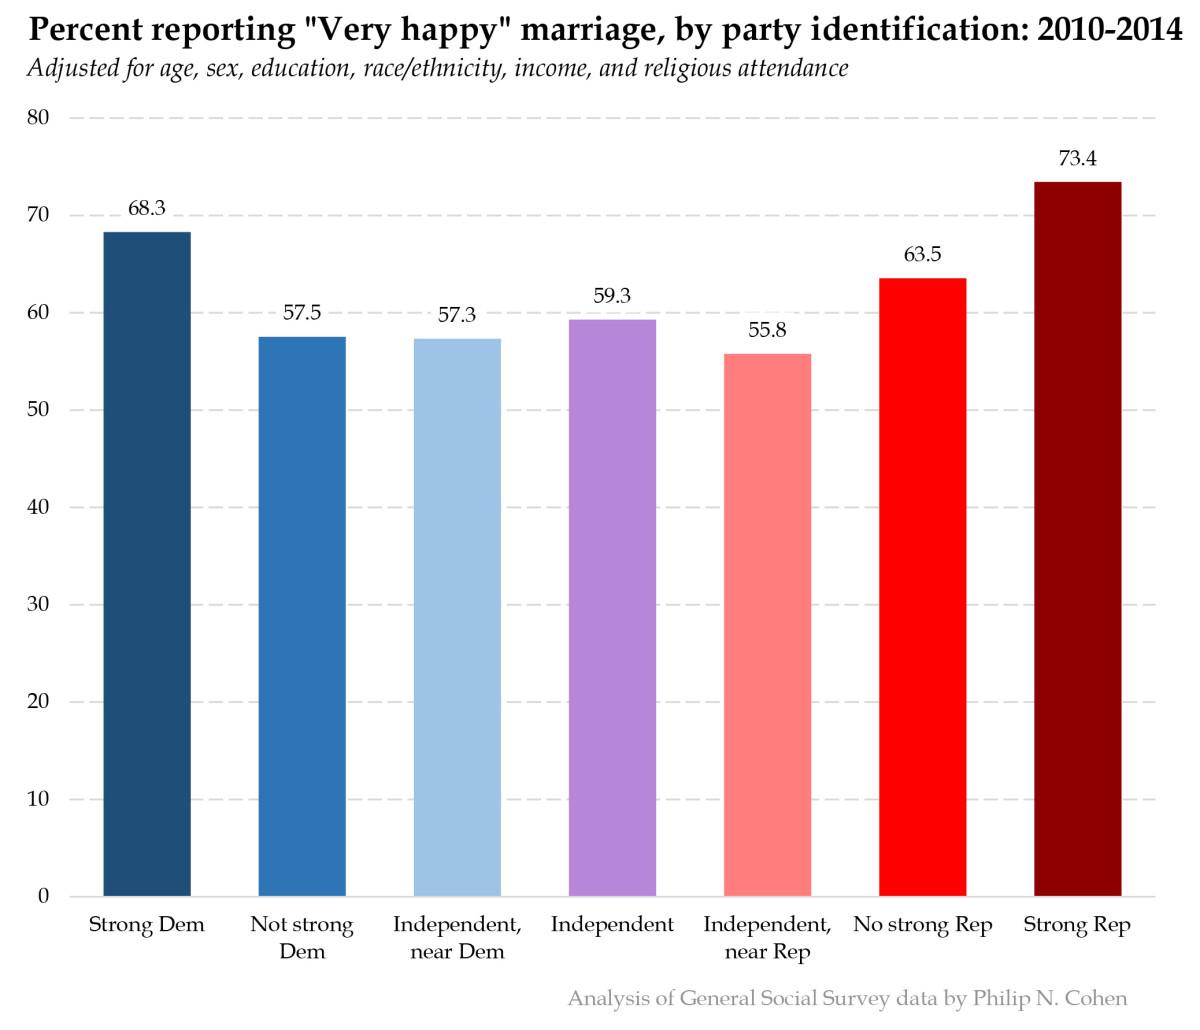 4-marital-happiness-partyid-adj1.jpg